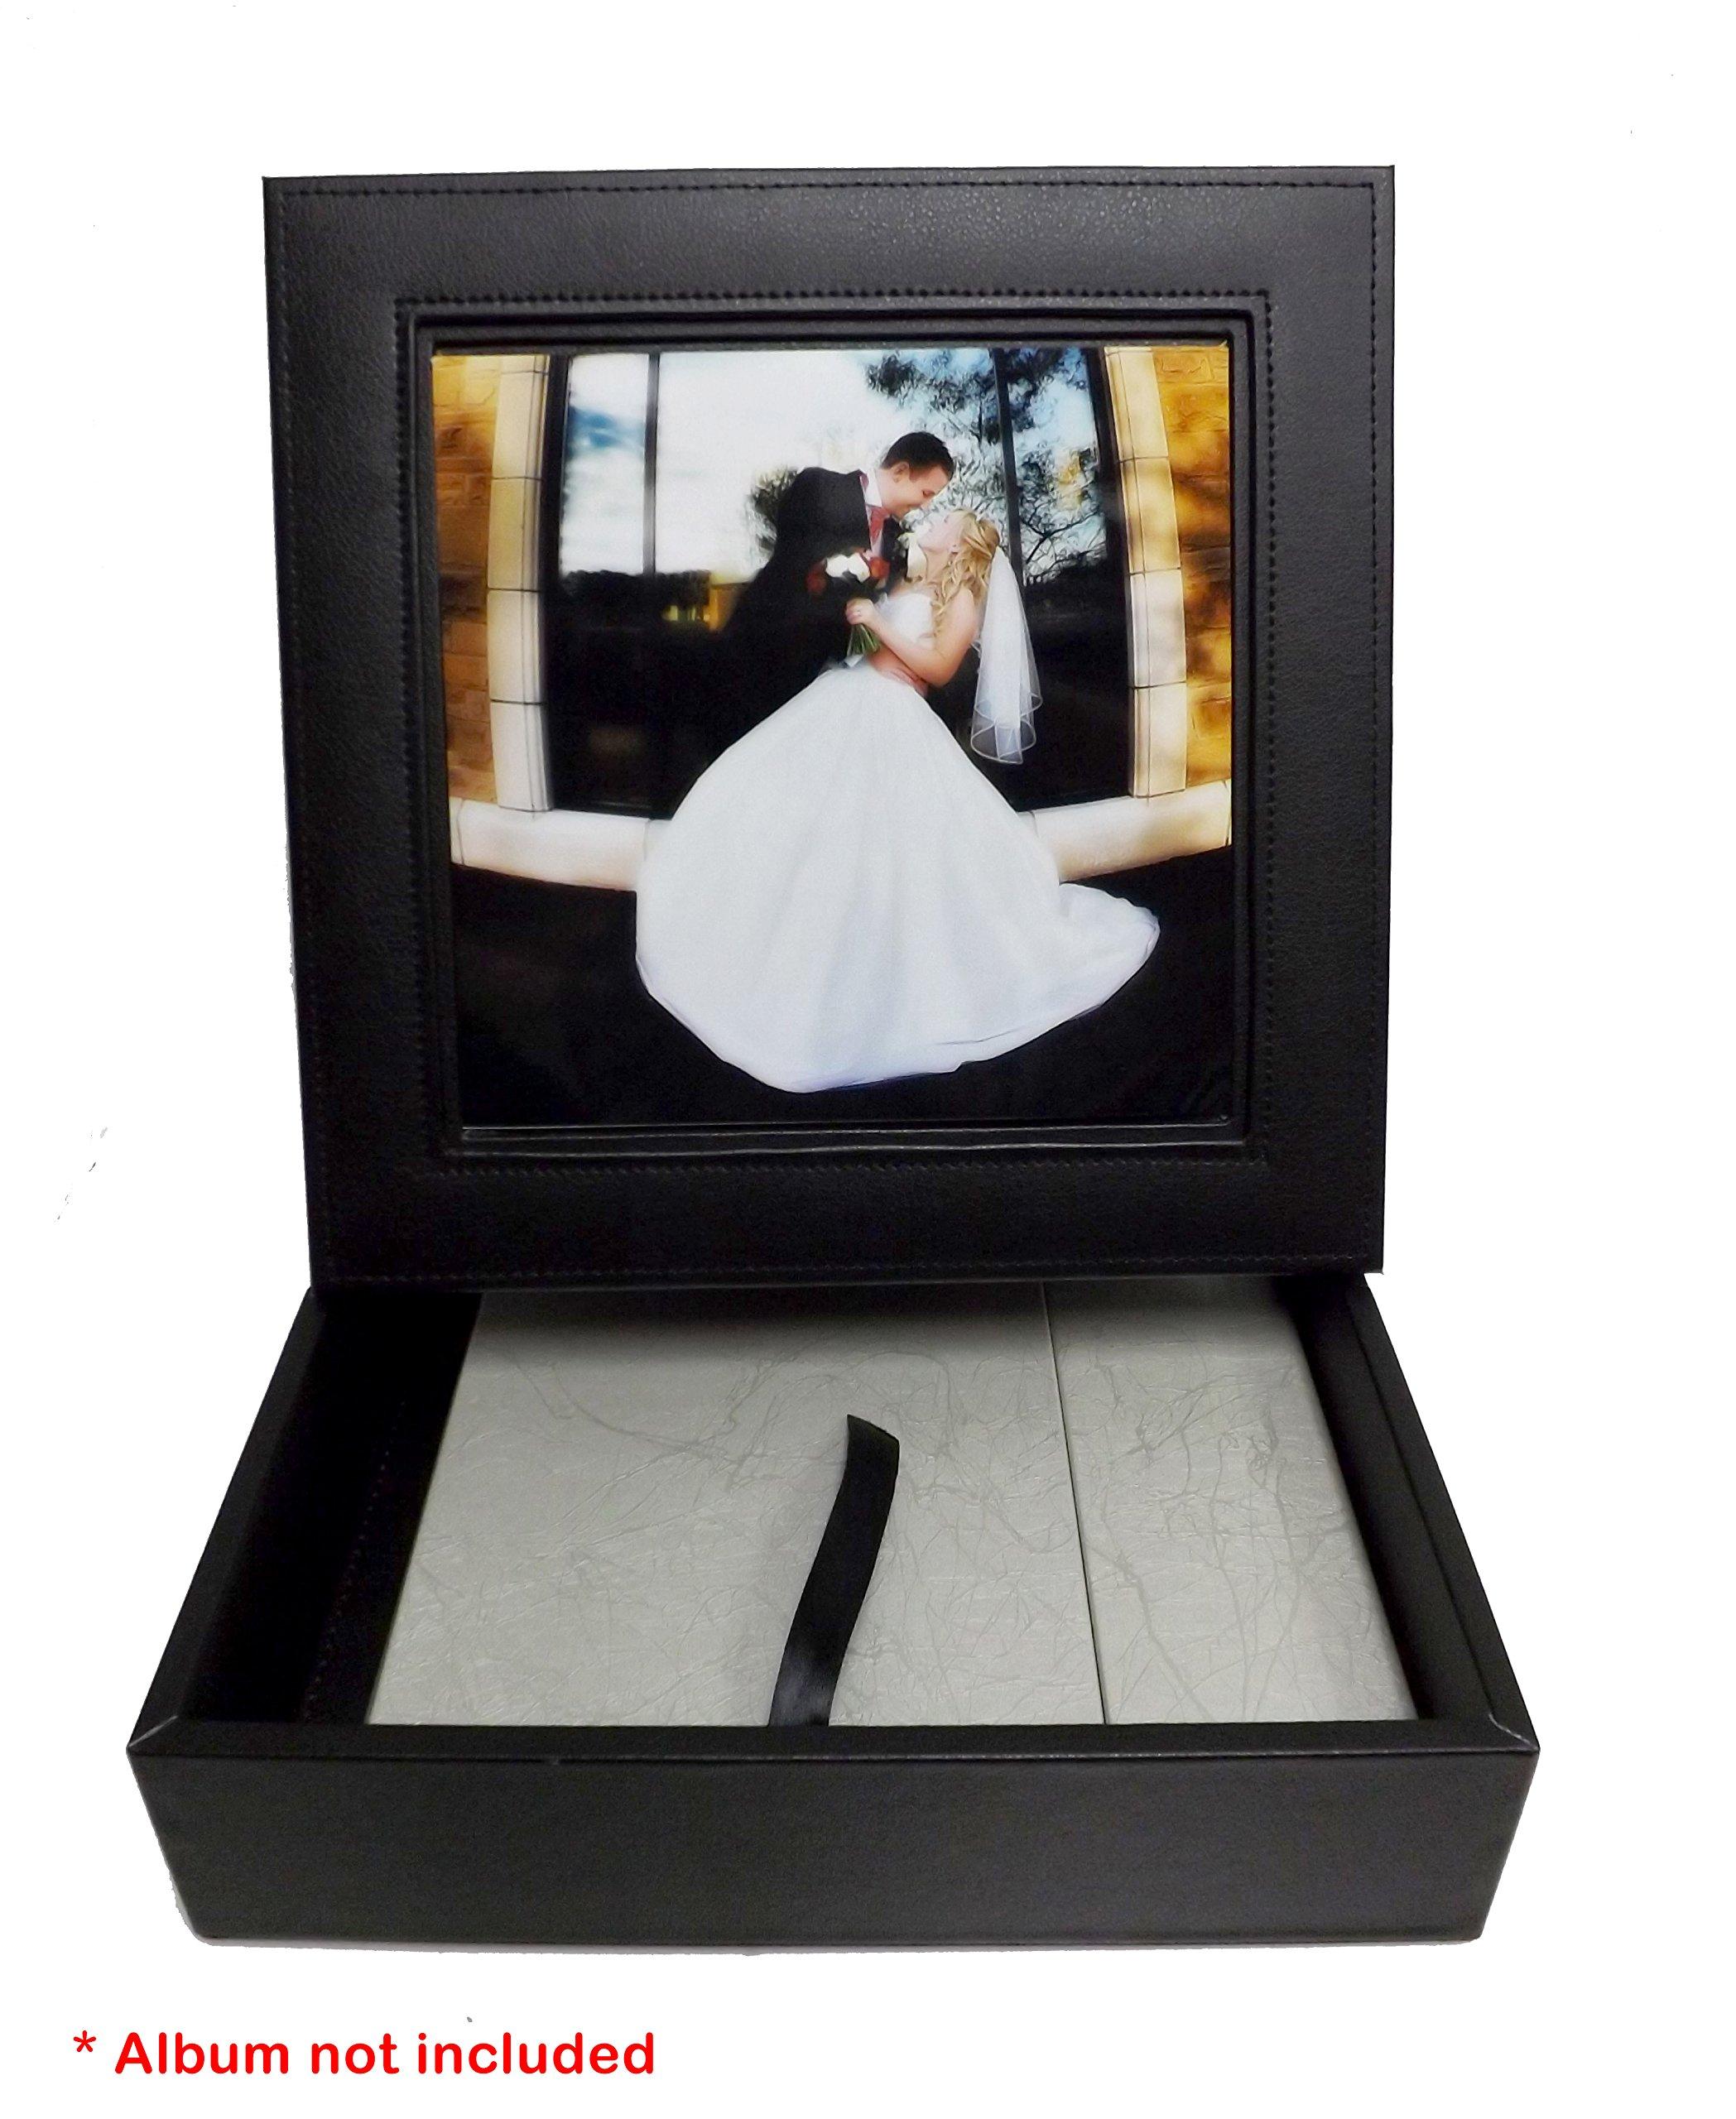 Showoff Albums Frame Box for Photo Album 12X12